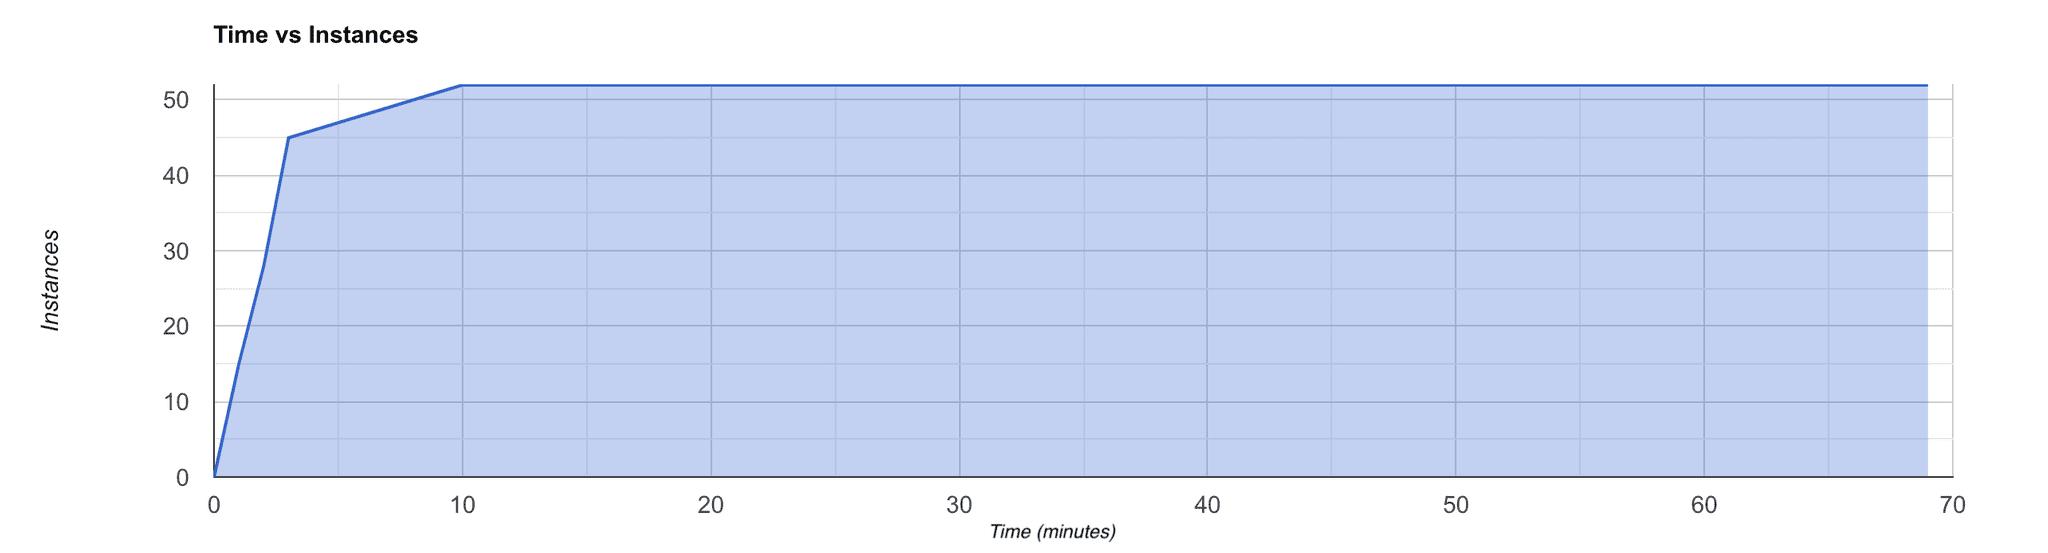 time-vs-instance-graph